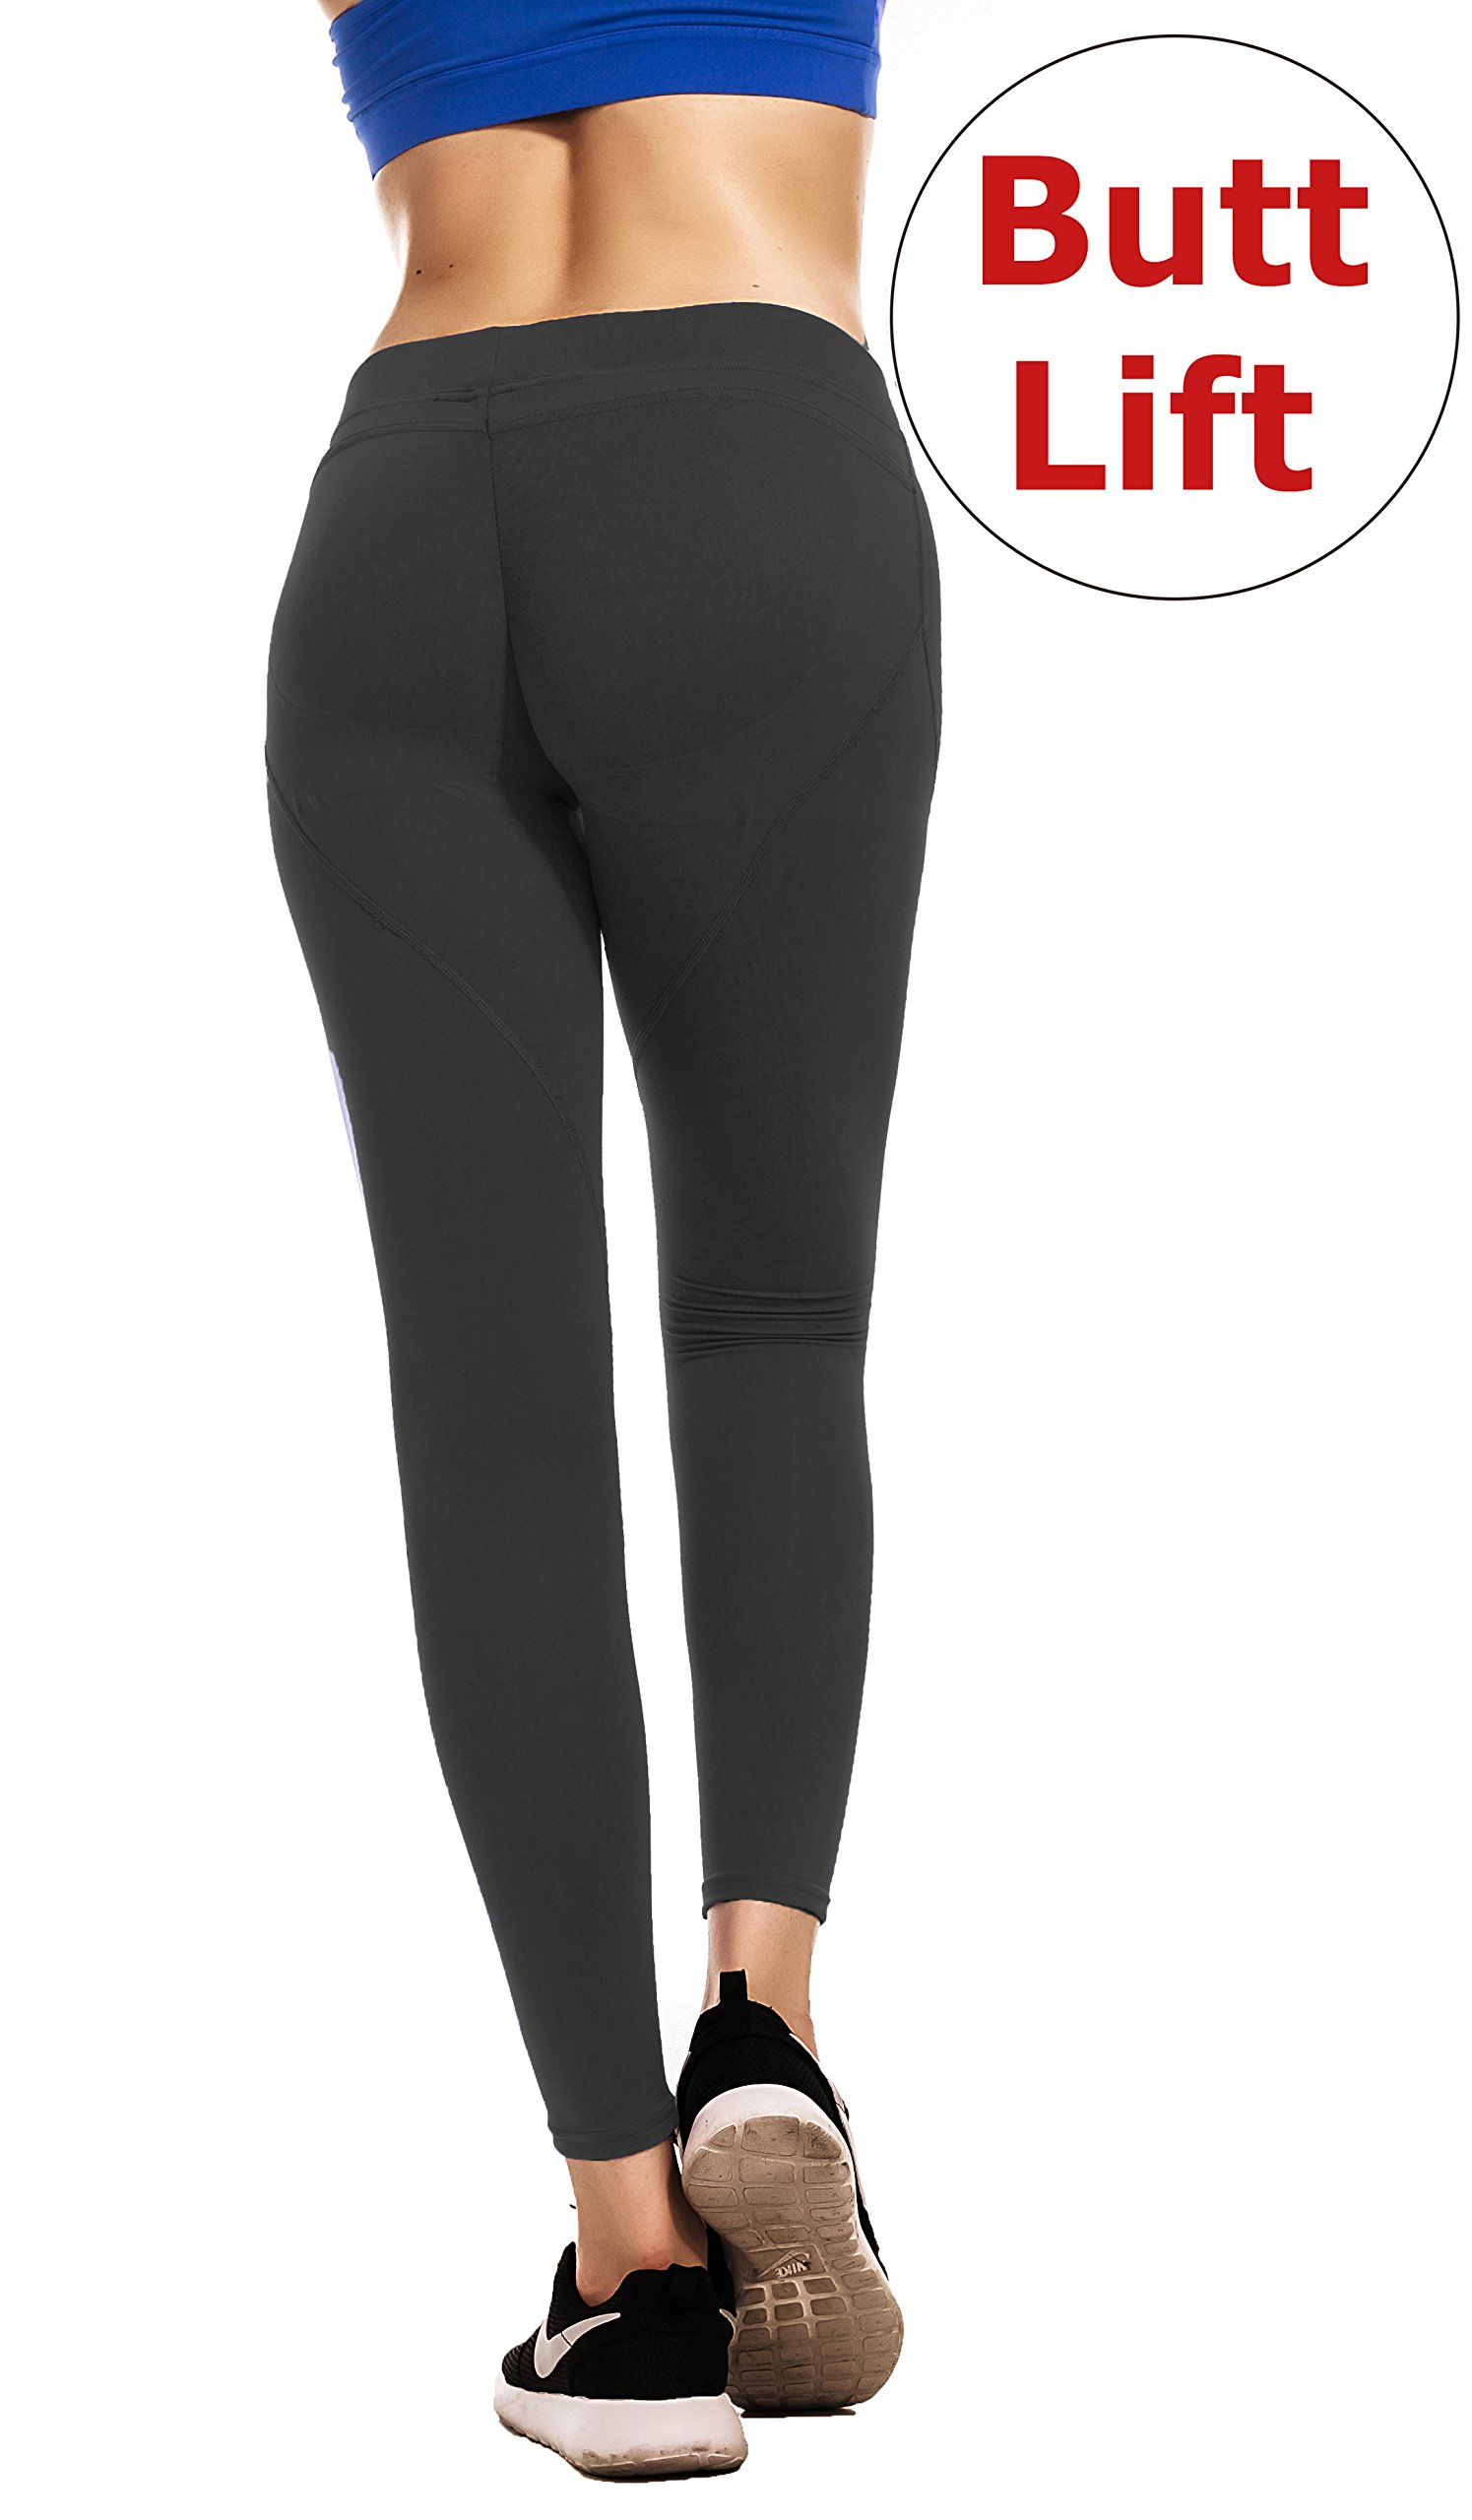 RUNNING GIRL Sexy Butt Lift Leggings Scrunch Butt Push up Leggings Yoga Pants for Women Shapewear Skinny Workout Tights(1068Black,L)